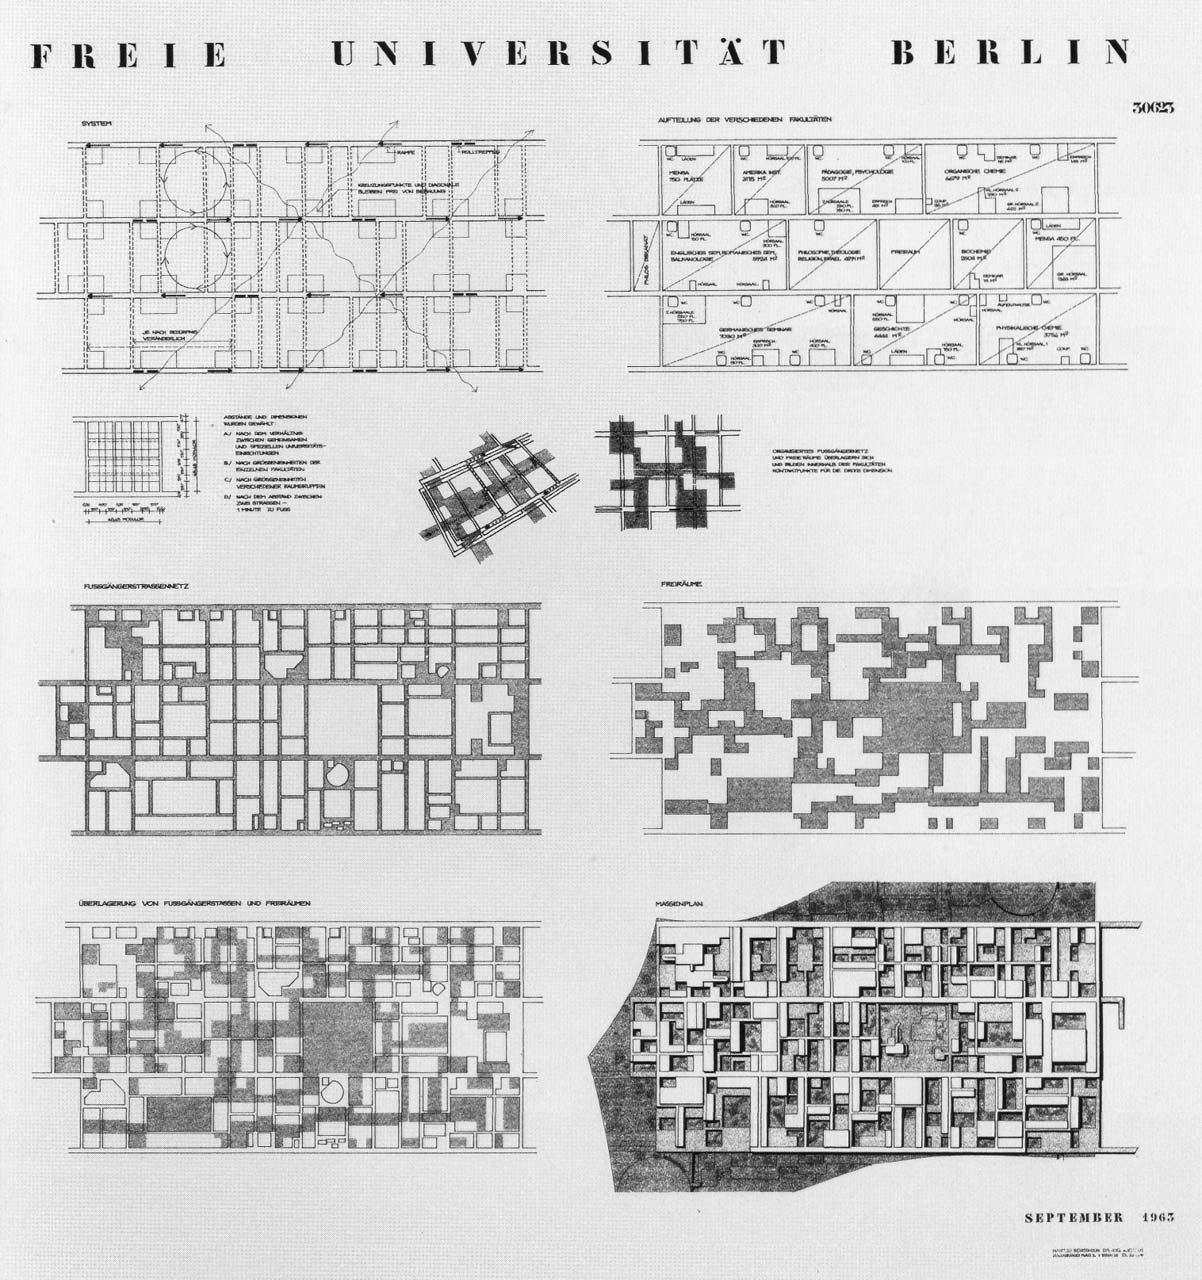 free-university-berlin-candilis-05